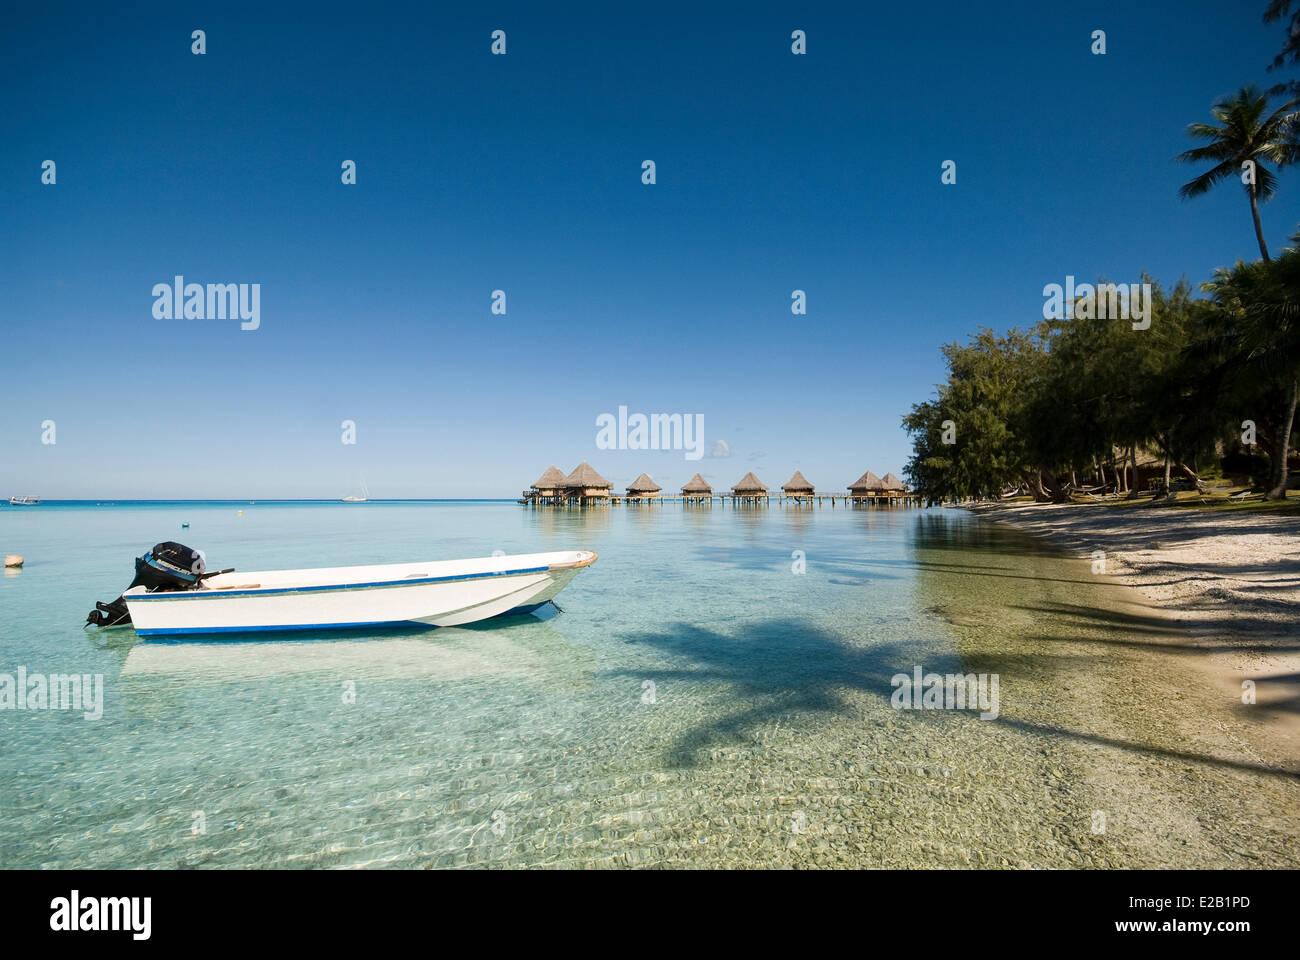 France, French Polynesia, Tuamotu islands, Rangiroa Atoll, motor boat to the beach bungalows - Stock Image